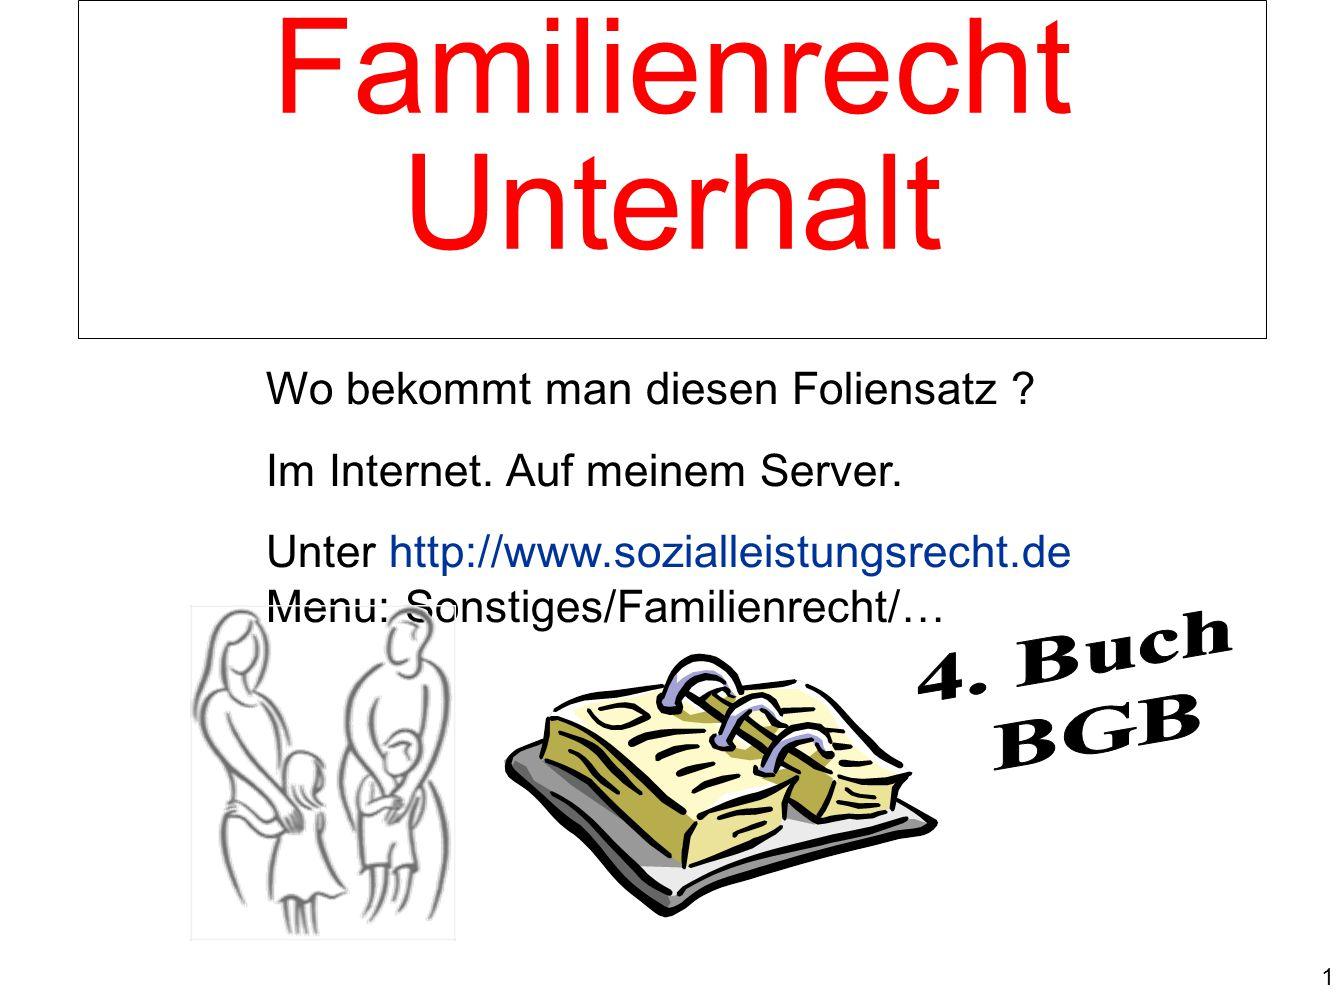 Familienrecht Unterhalt